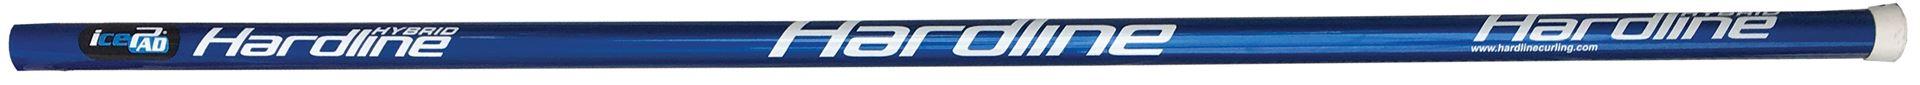 Blue HELIUM Hybrid handle